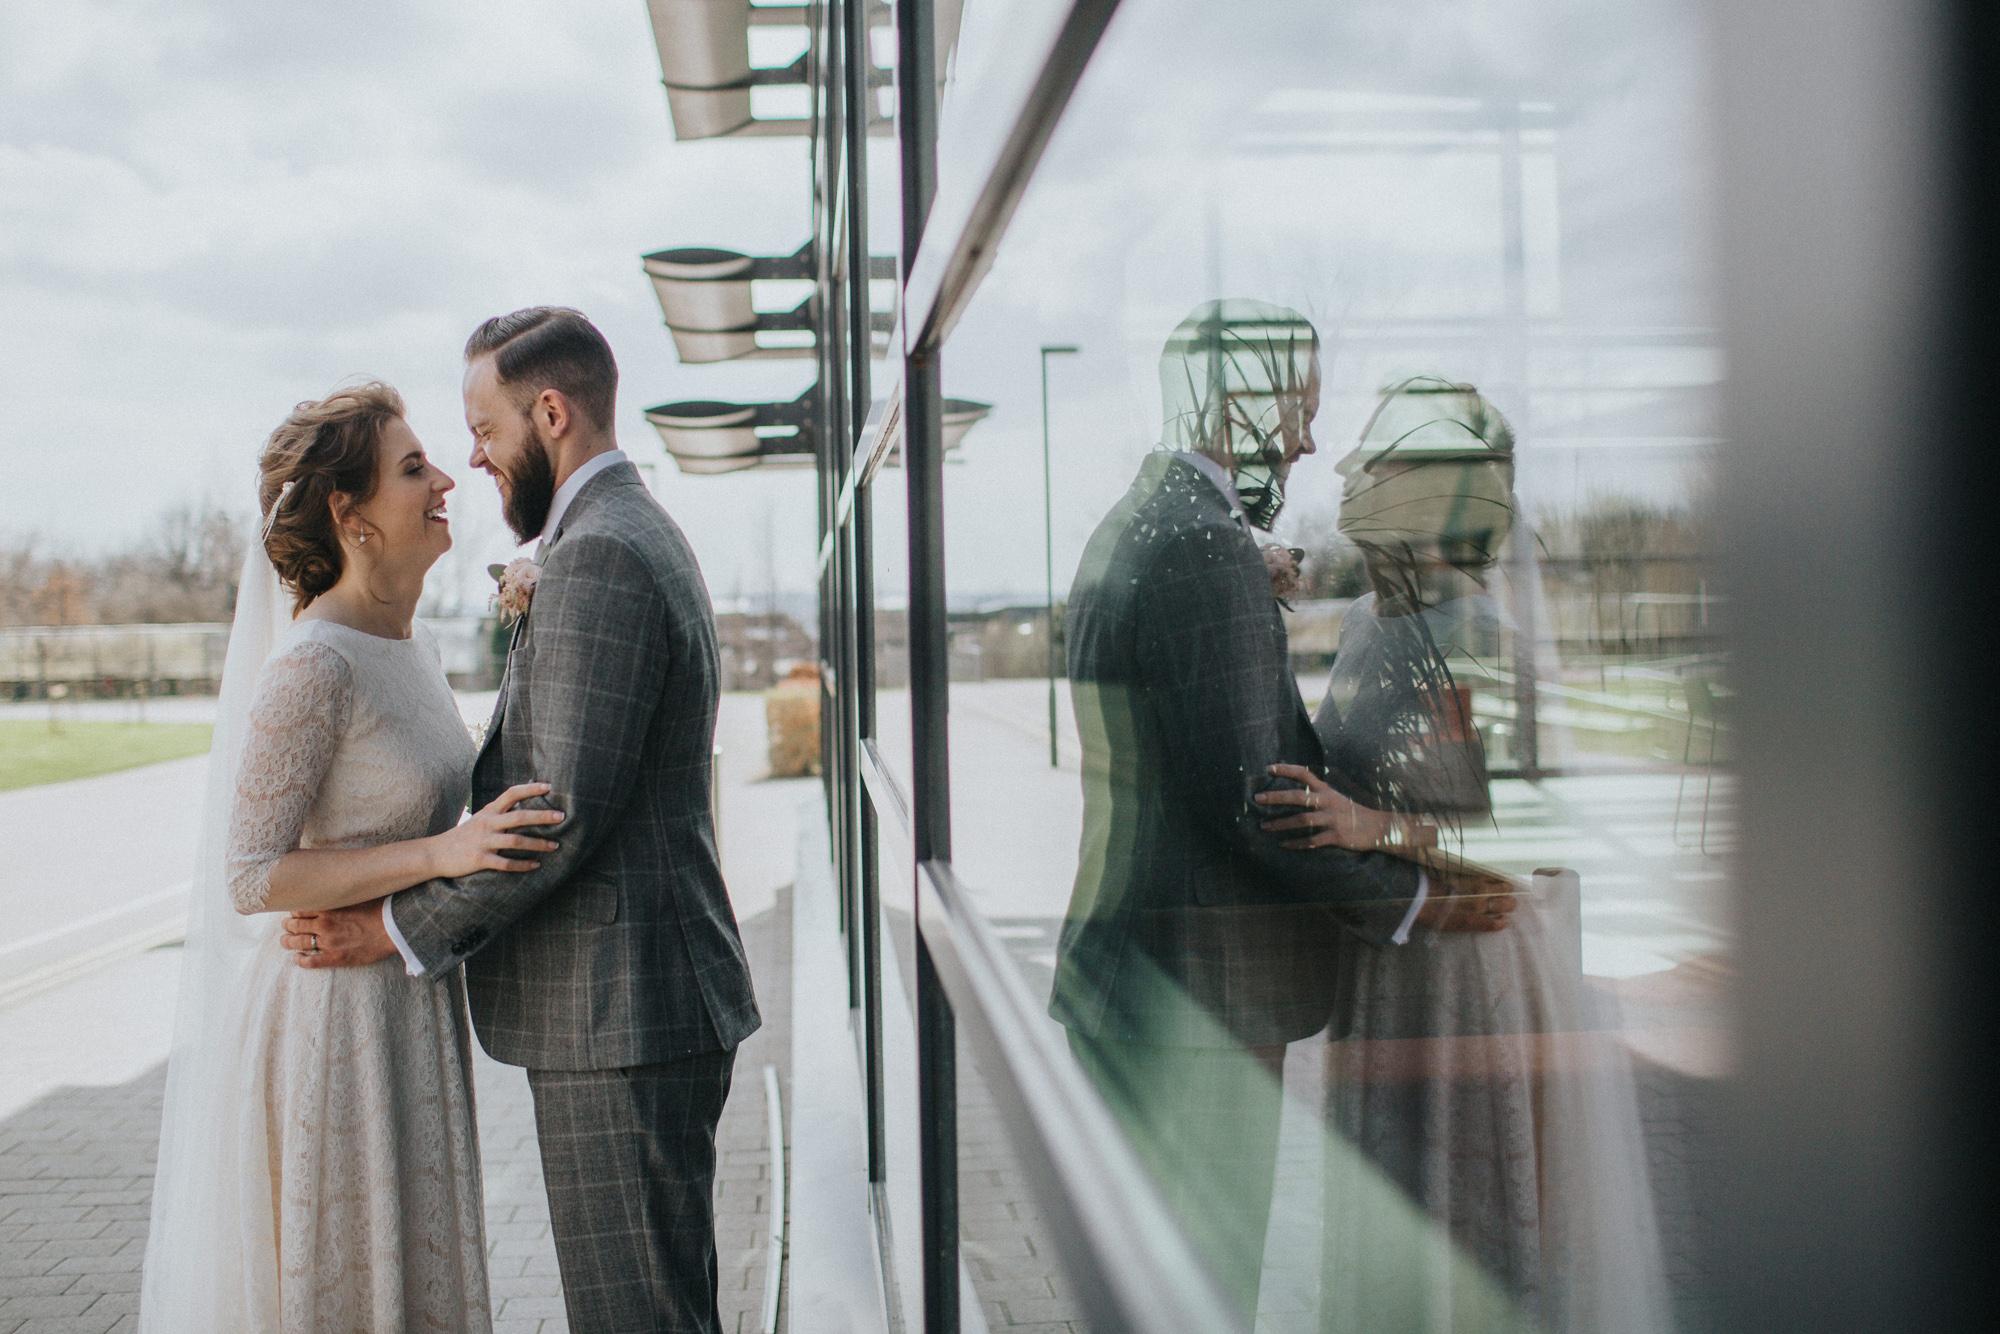 Kate-Beaumont-Lace-Flared-Dahlia-Gown-Leeds-Wedding-Bloom-Weddings-40.jpg